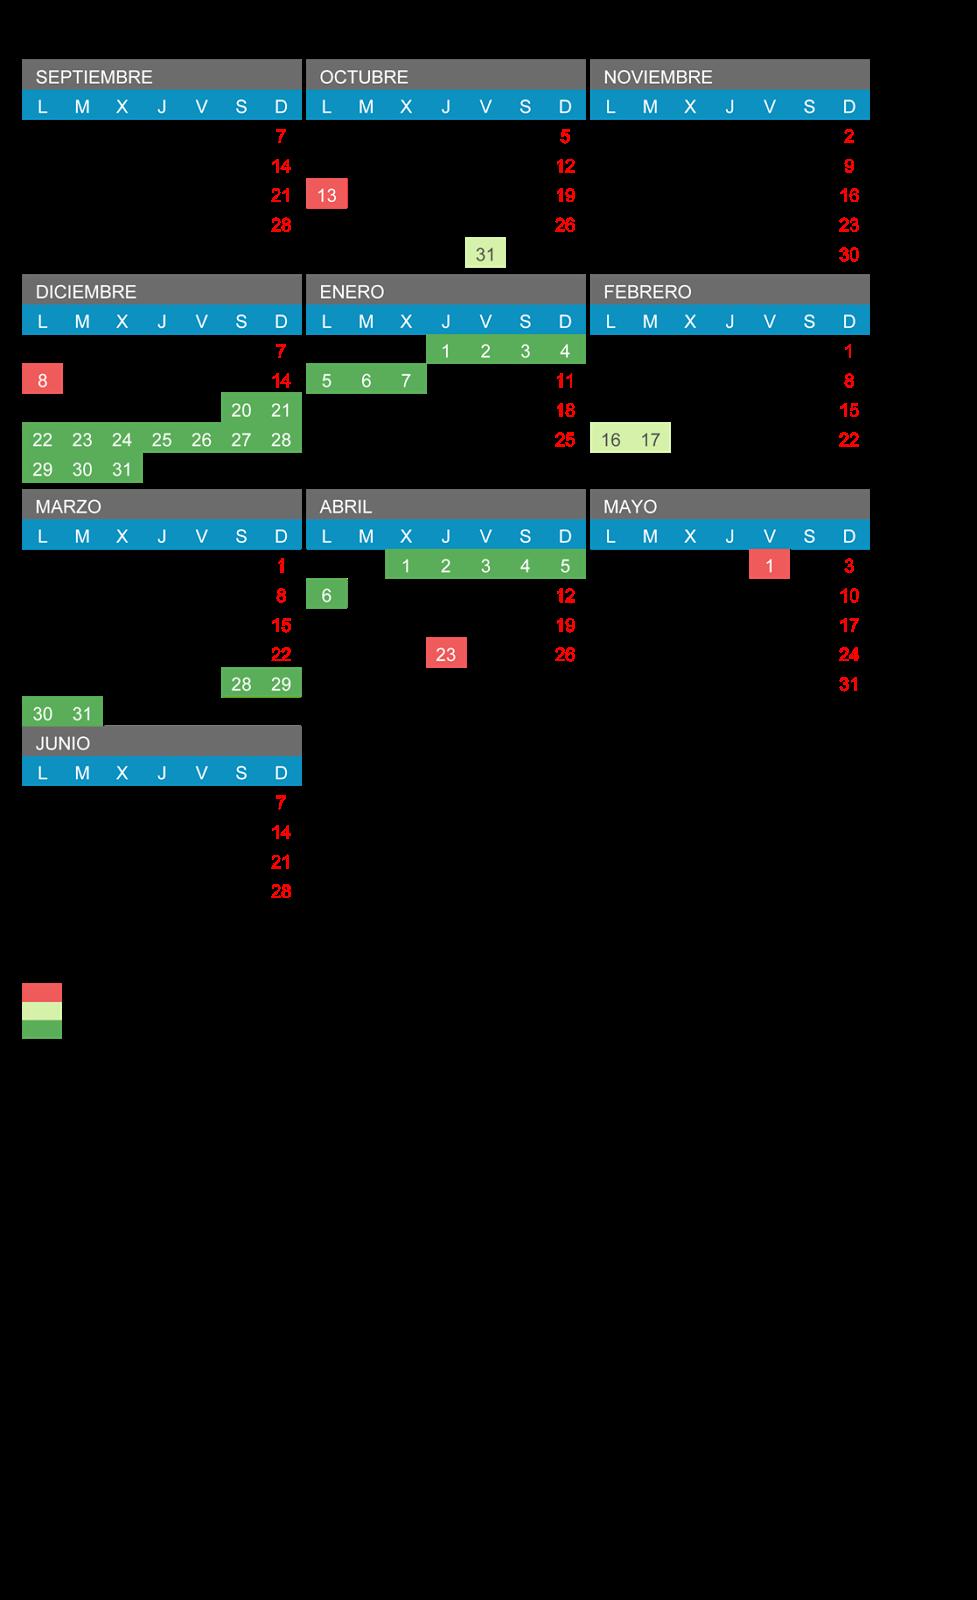 Calendario Educacyl.Ampa El Morco Calendario Escolar 2014 2015